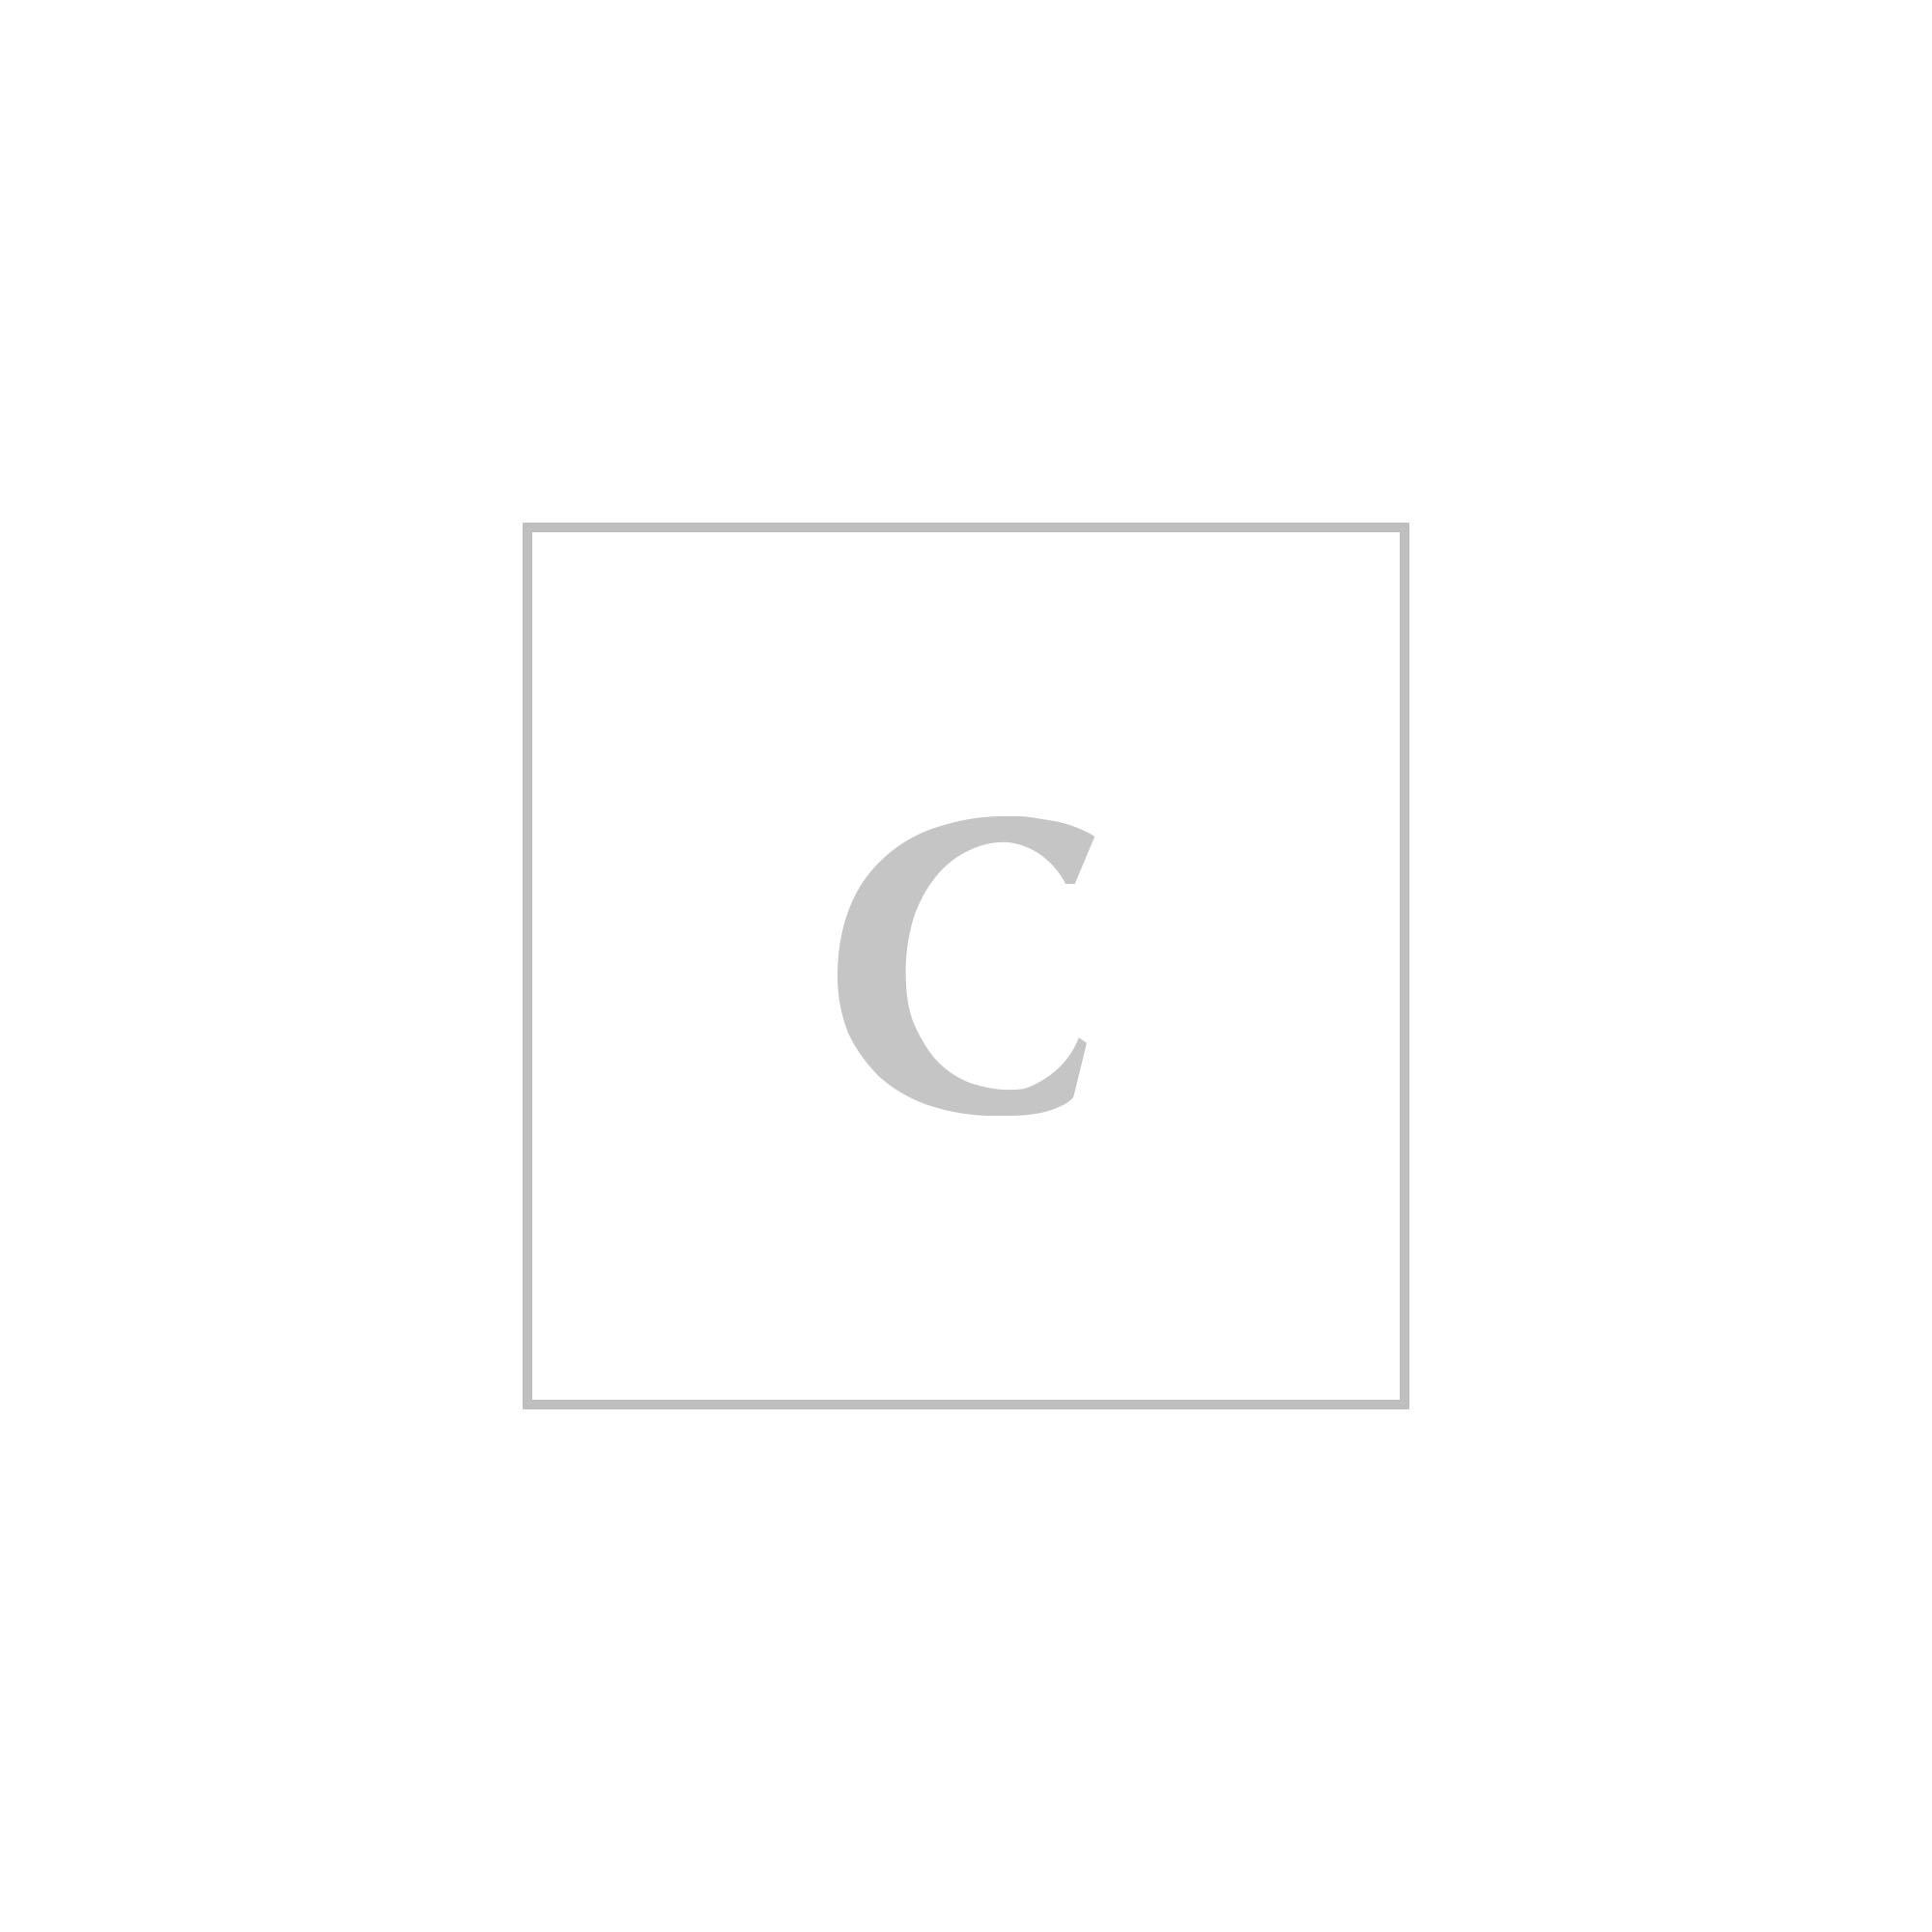 Saint laurent monogram cardholder